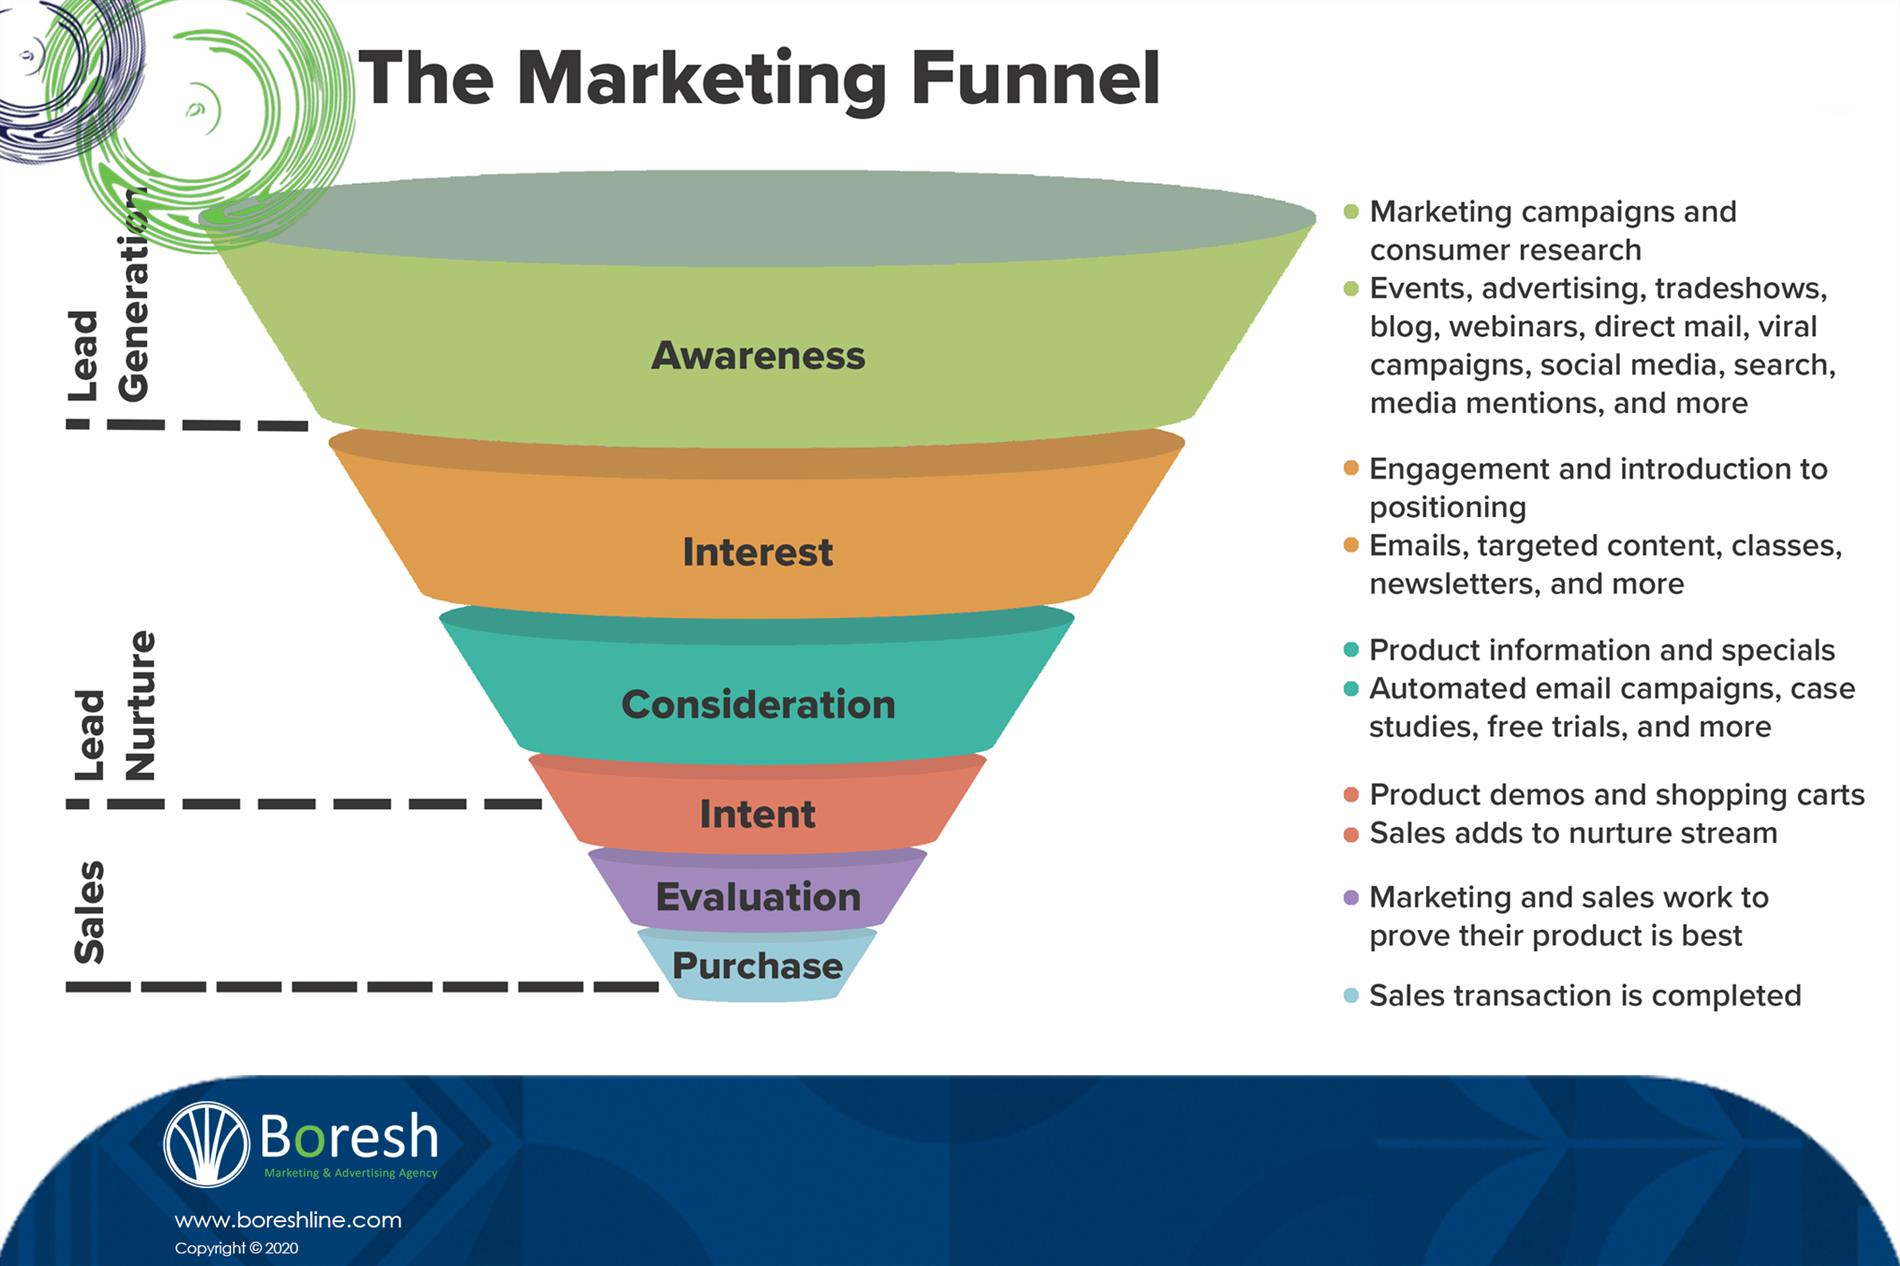 Marketing Funnel یا همان قیف فروش در علم بازاریابی چیست ؟ - گروه برندسازی، تبلیغات،بازاریابی و توسعه کسب و کار برش